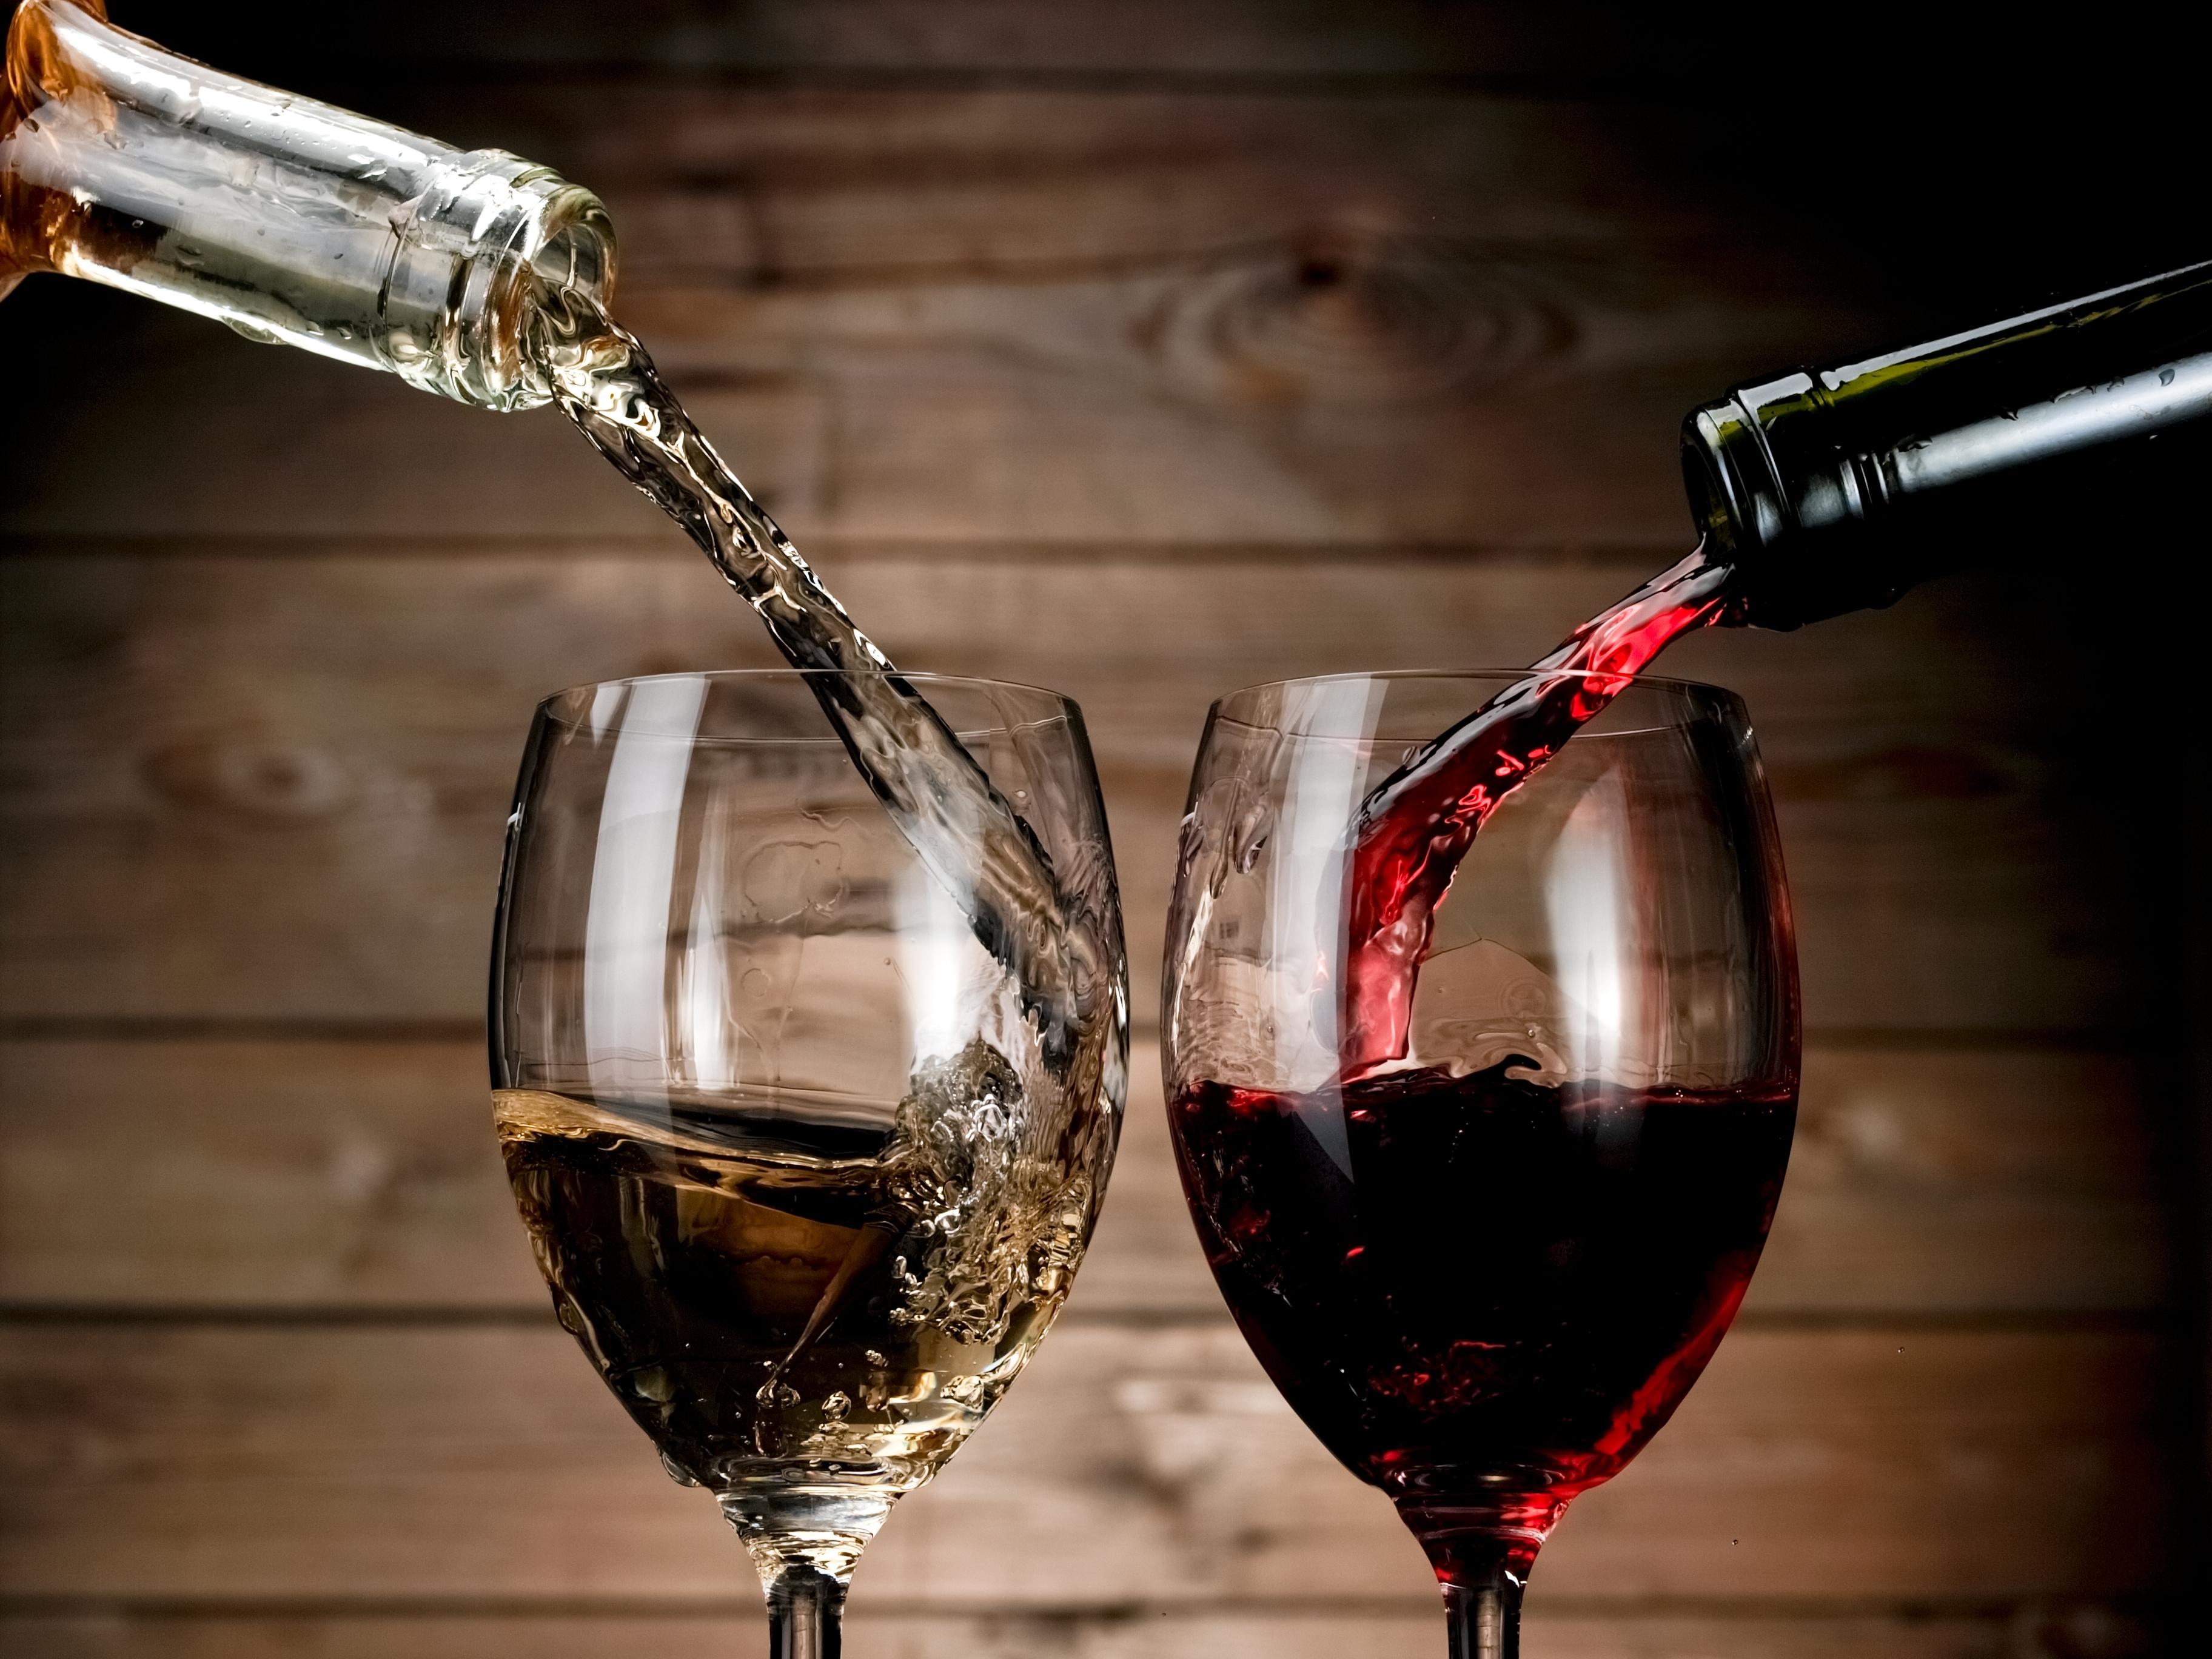 Kilka mitów na temat wina